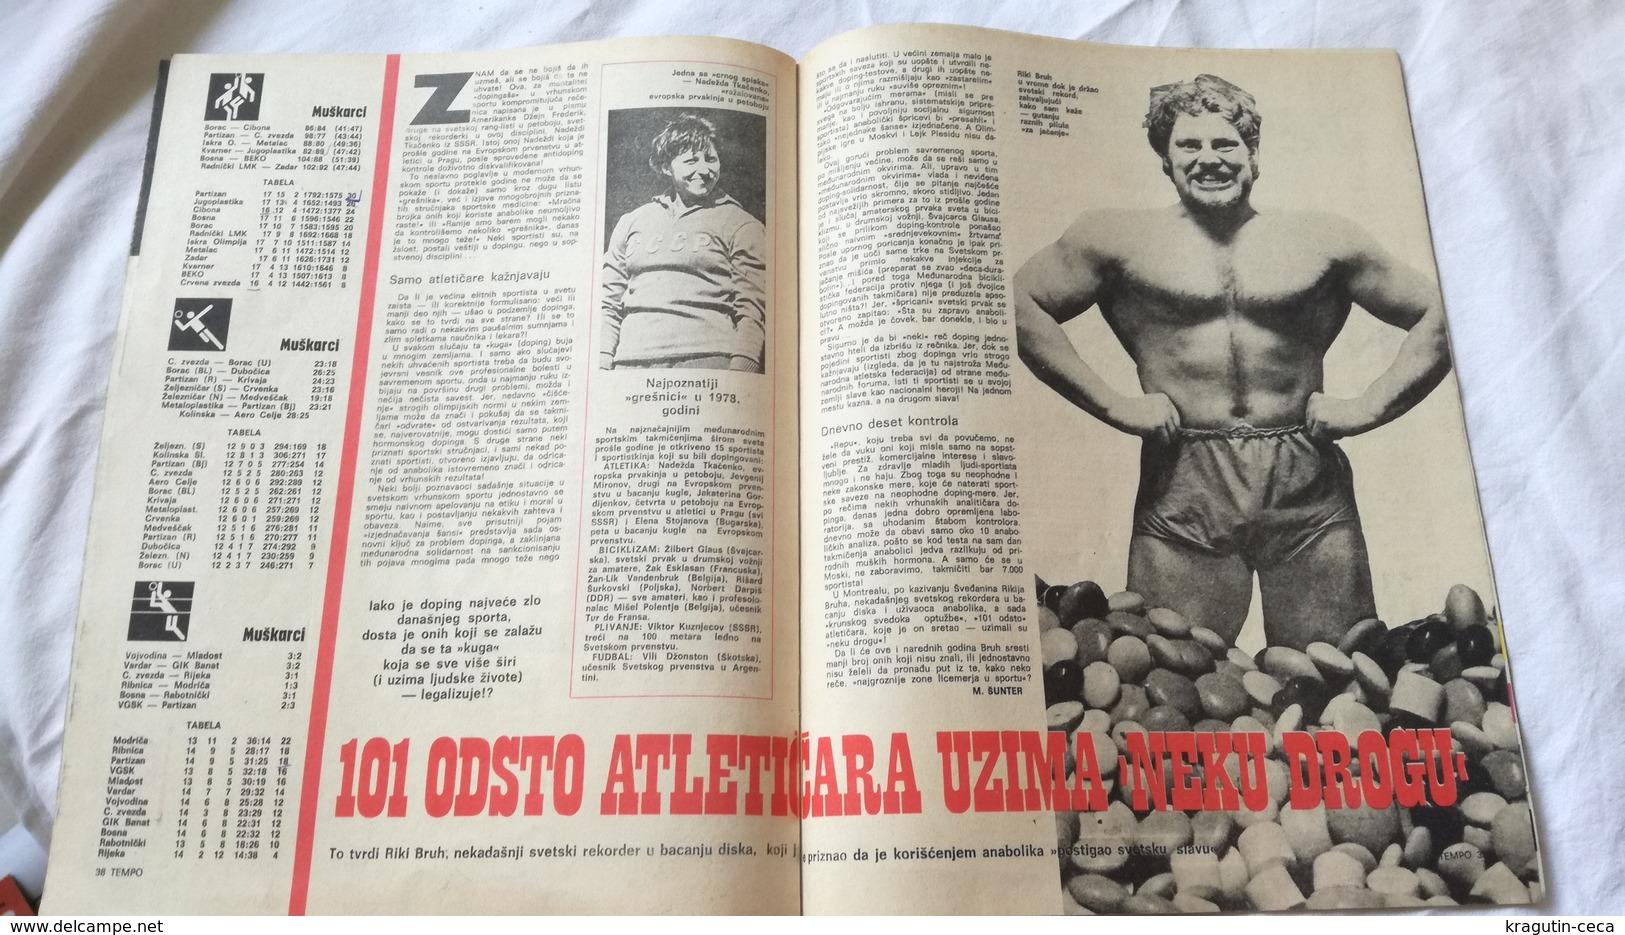 1979 TEMPO YUGOSLAVIA SERBIA SPORT FOOTBALL MAGAZINE NEWSPAPERS Pele Athletics HANDBALL UEFA LEAGUE - Deportes